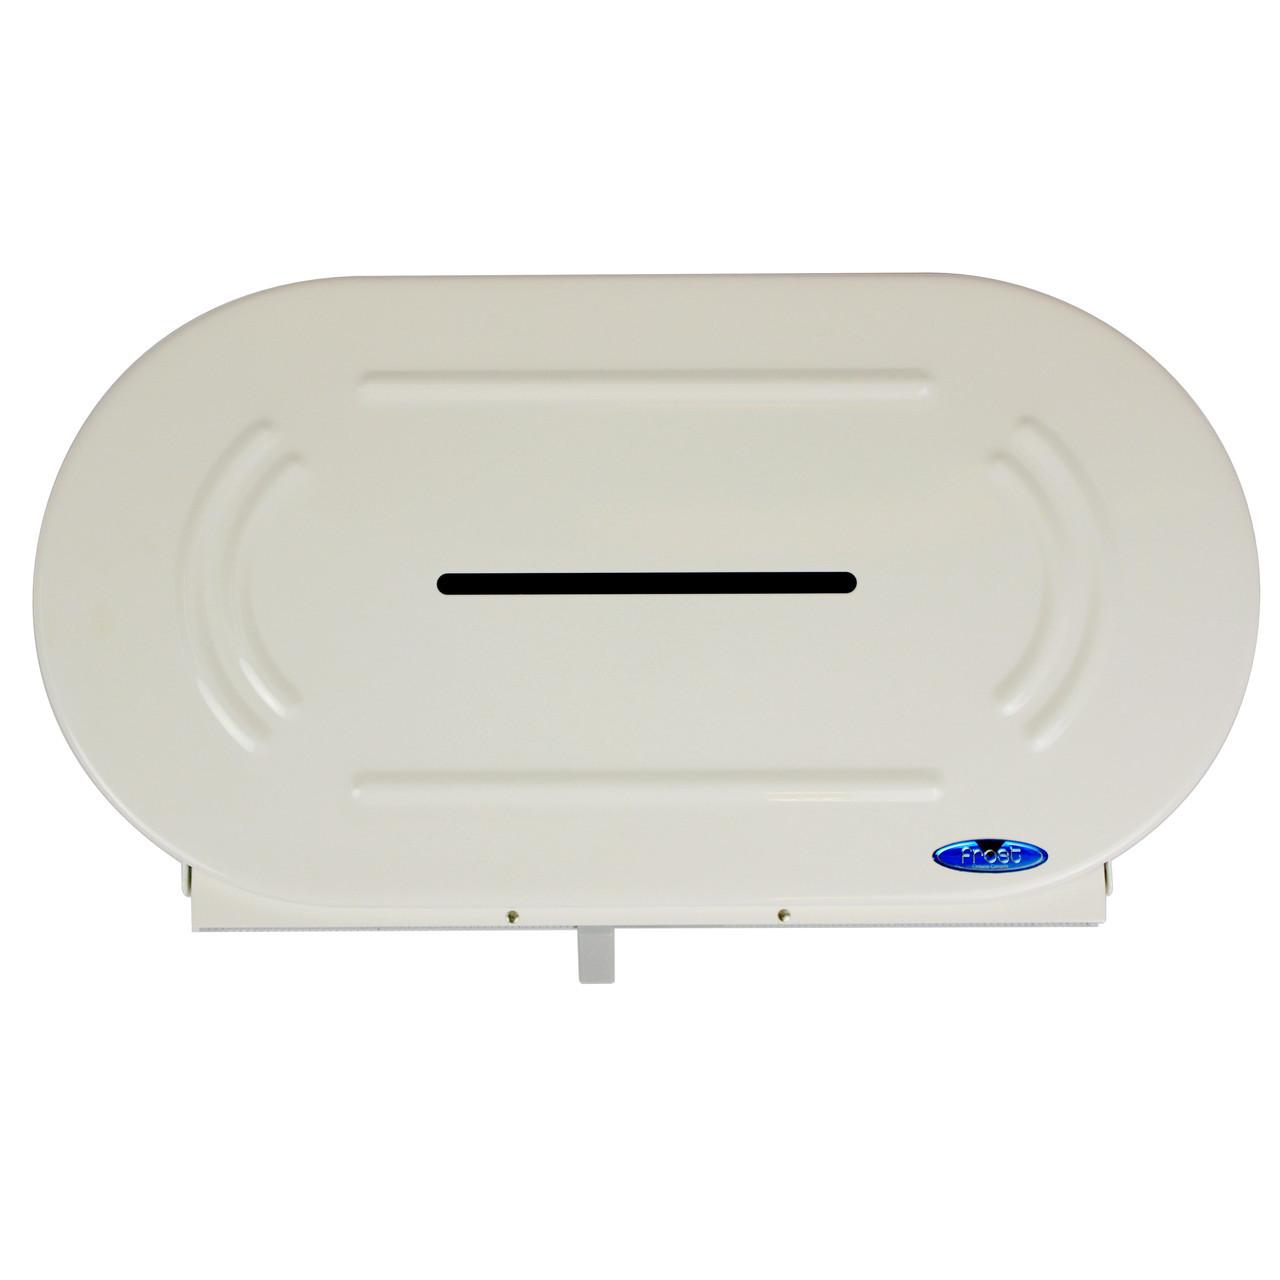 Frost 169 - Twin Jumbo Roll Toilet Tissue Dispenser   Handy Washroom